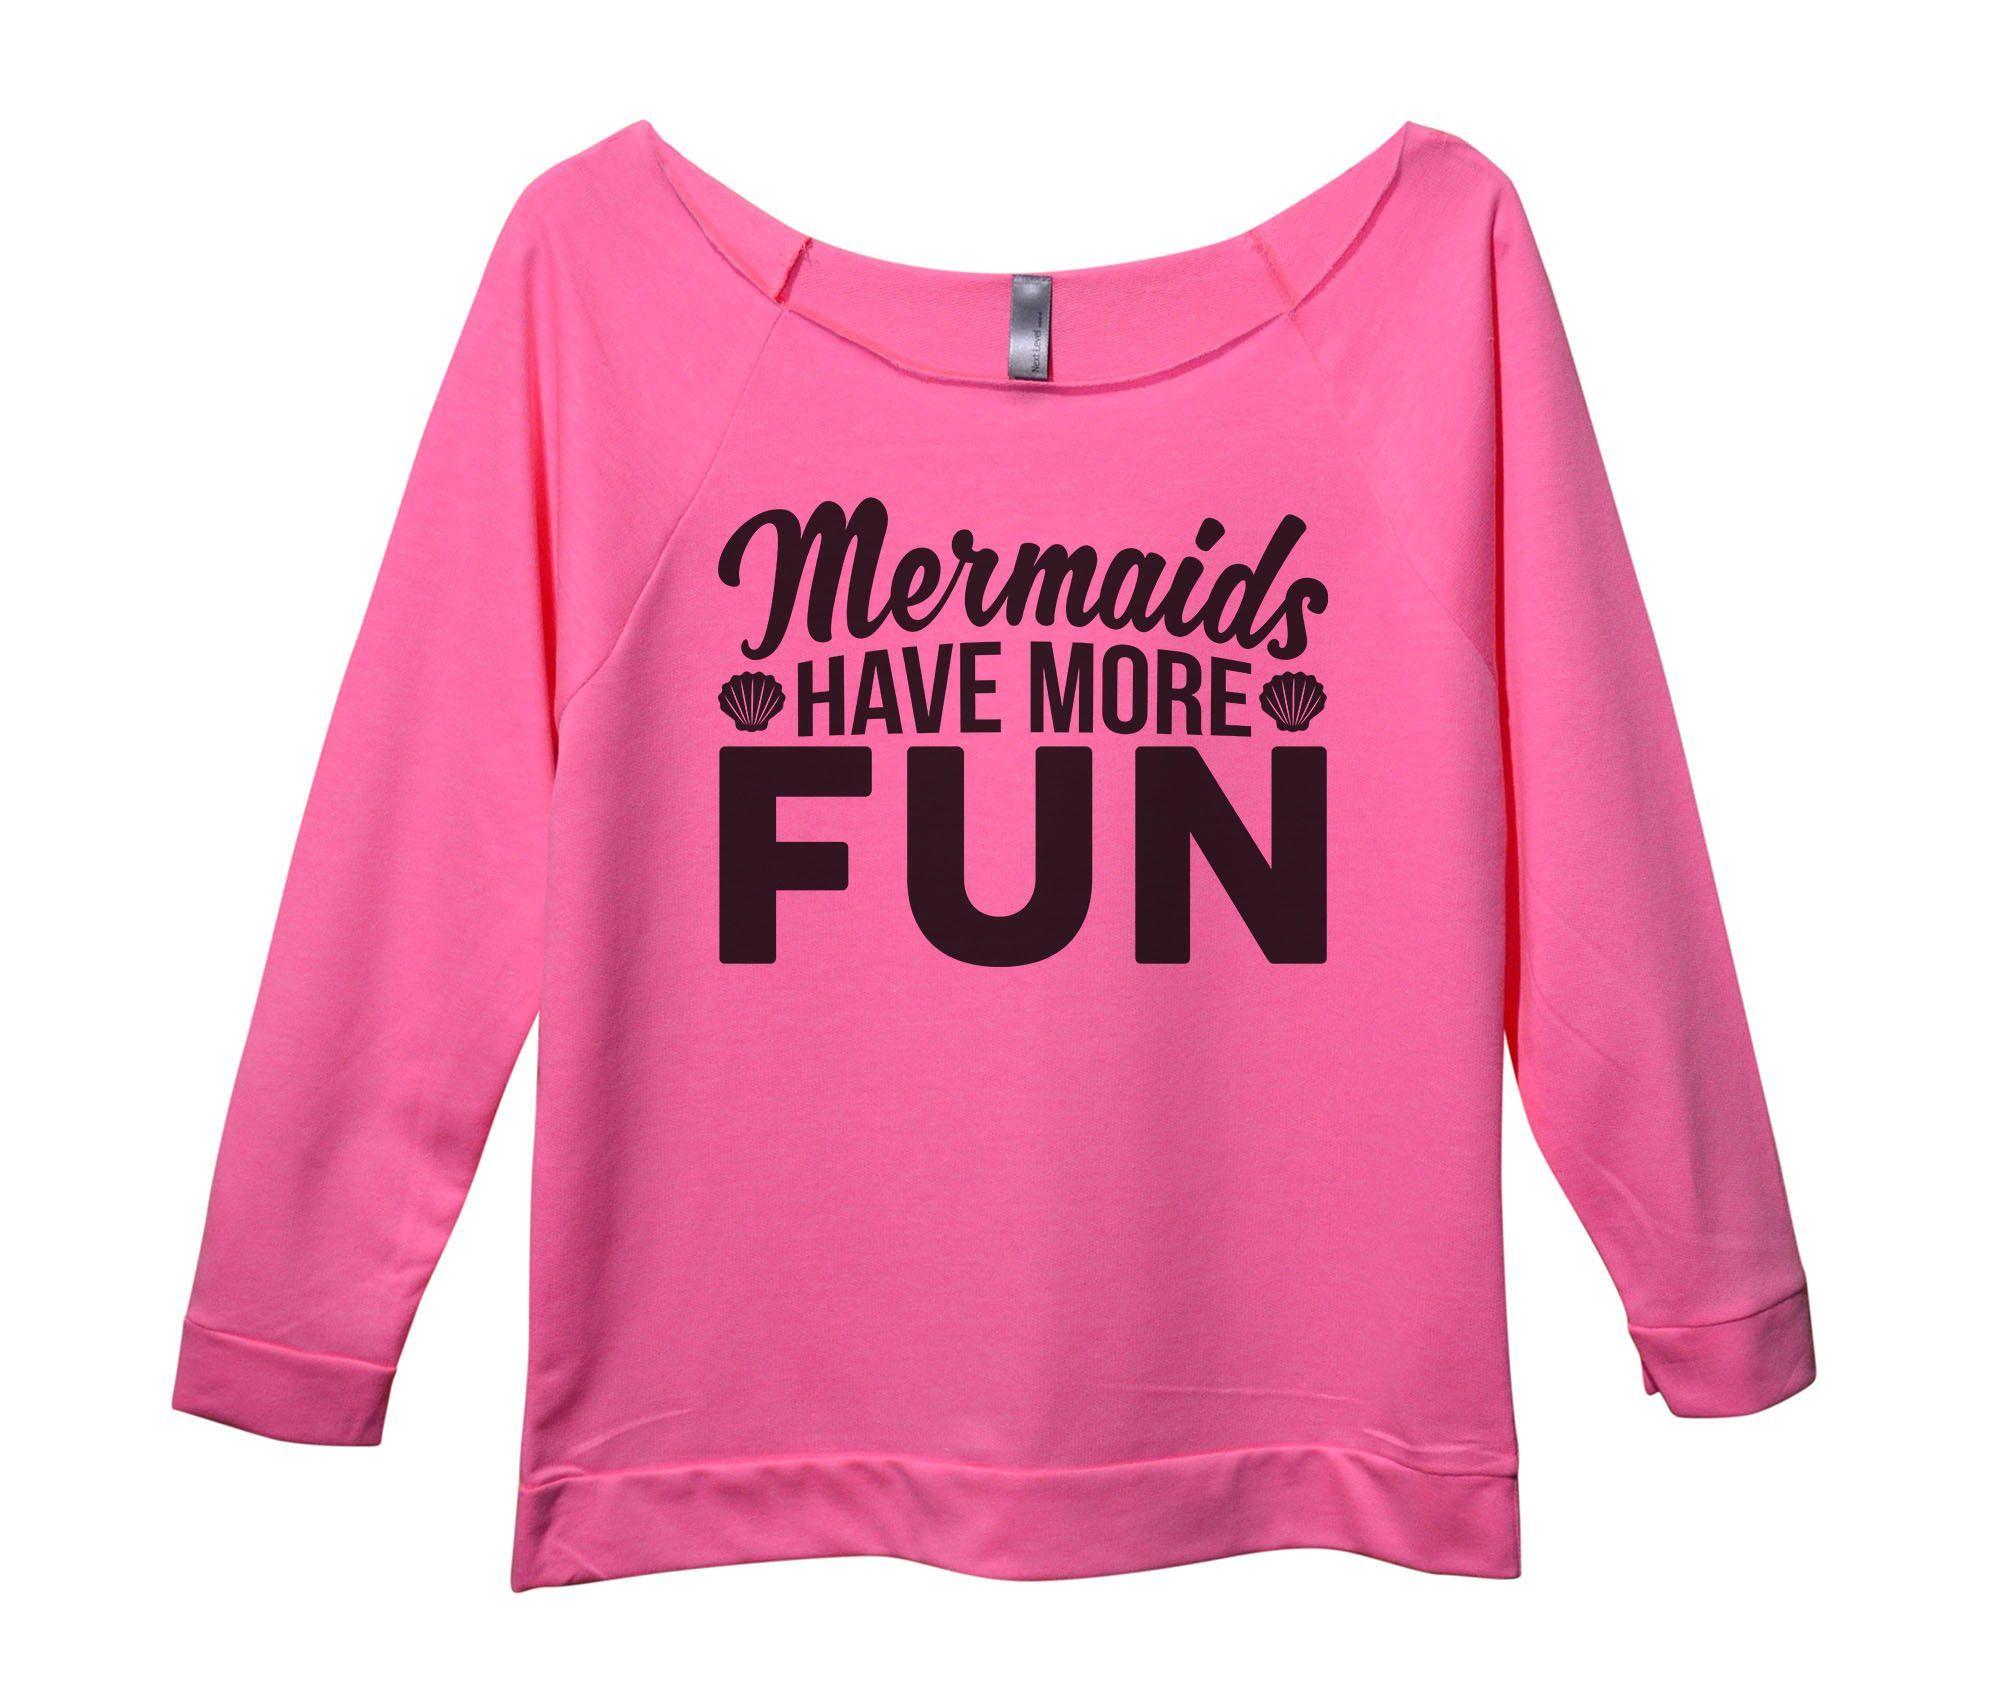 Mermaids Have More Fun Womens 3/4 Long Sleeve Vintage Raw Edge Shirt